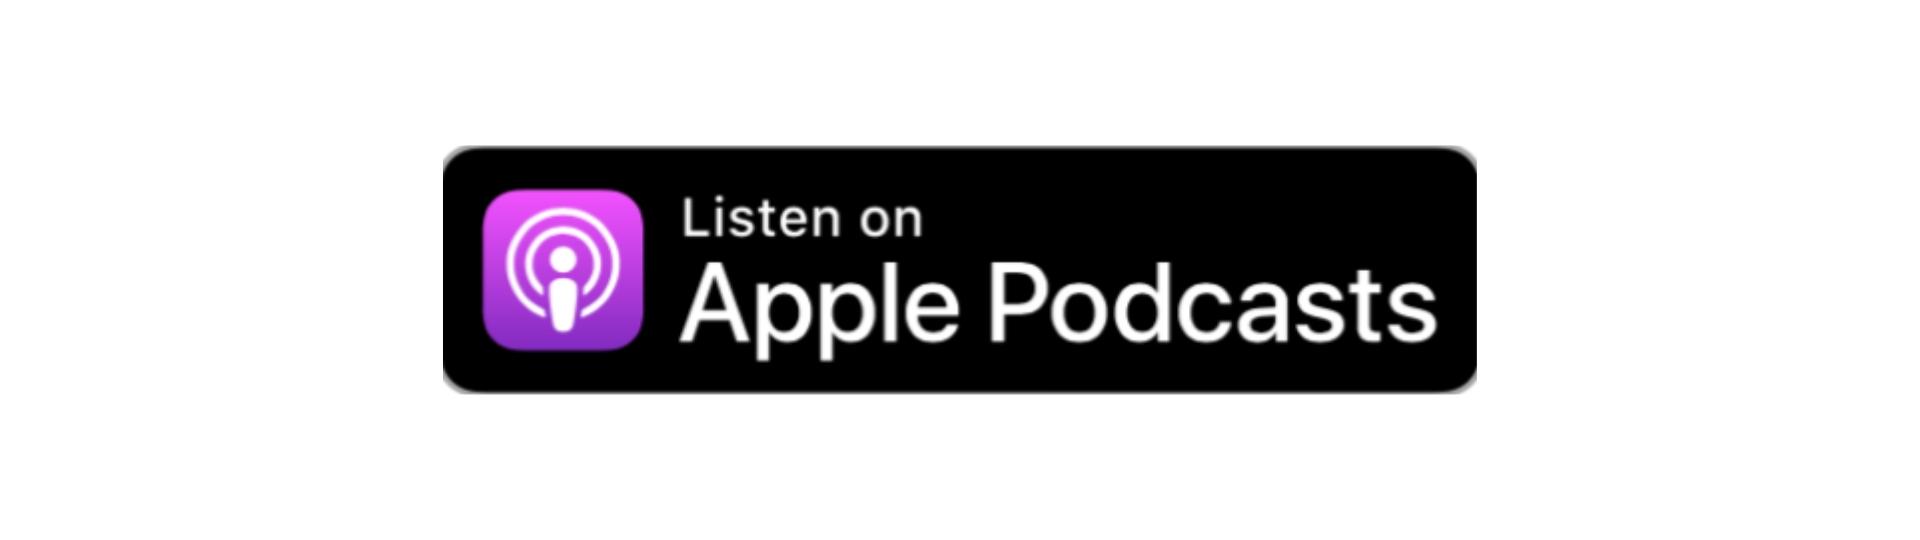 Apple Podcast Icon.jpg